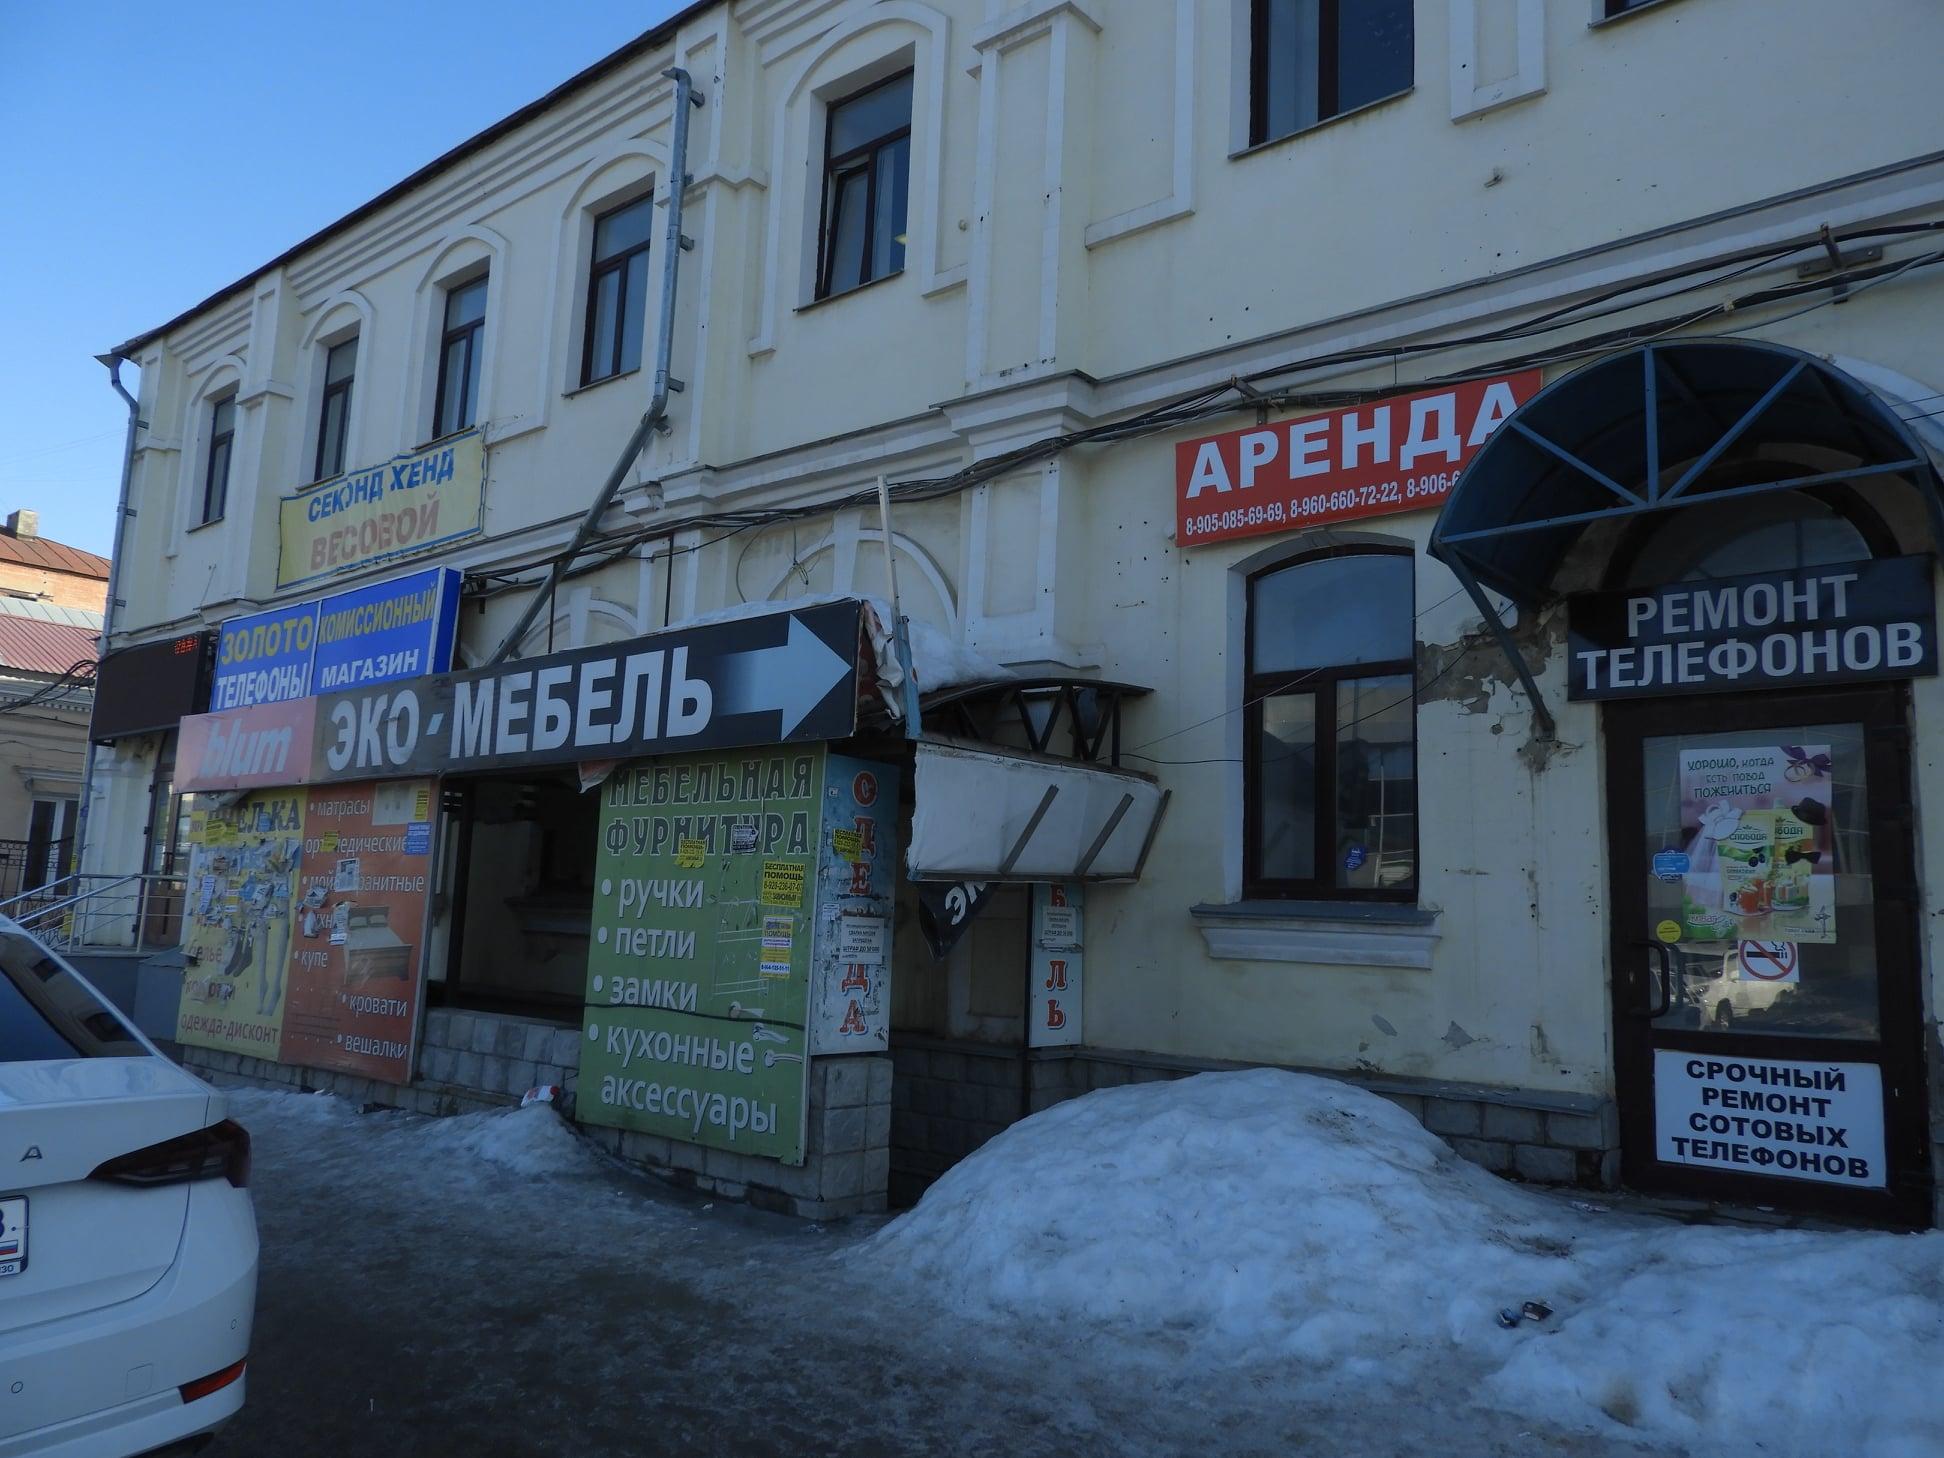 В Тамбове требуют провести ремонт дома купца Петина